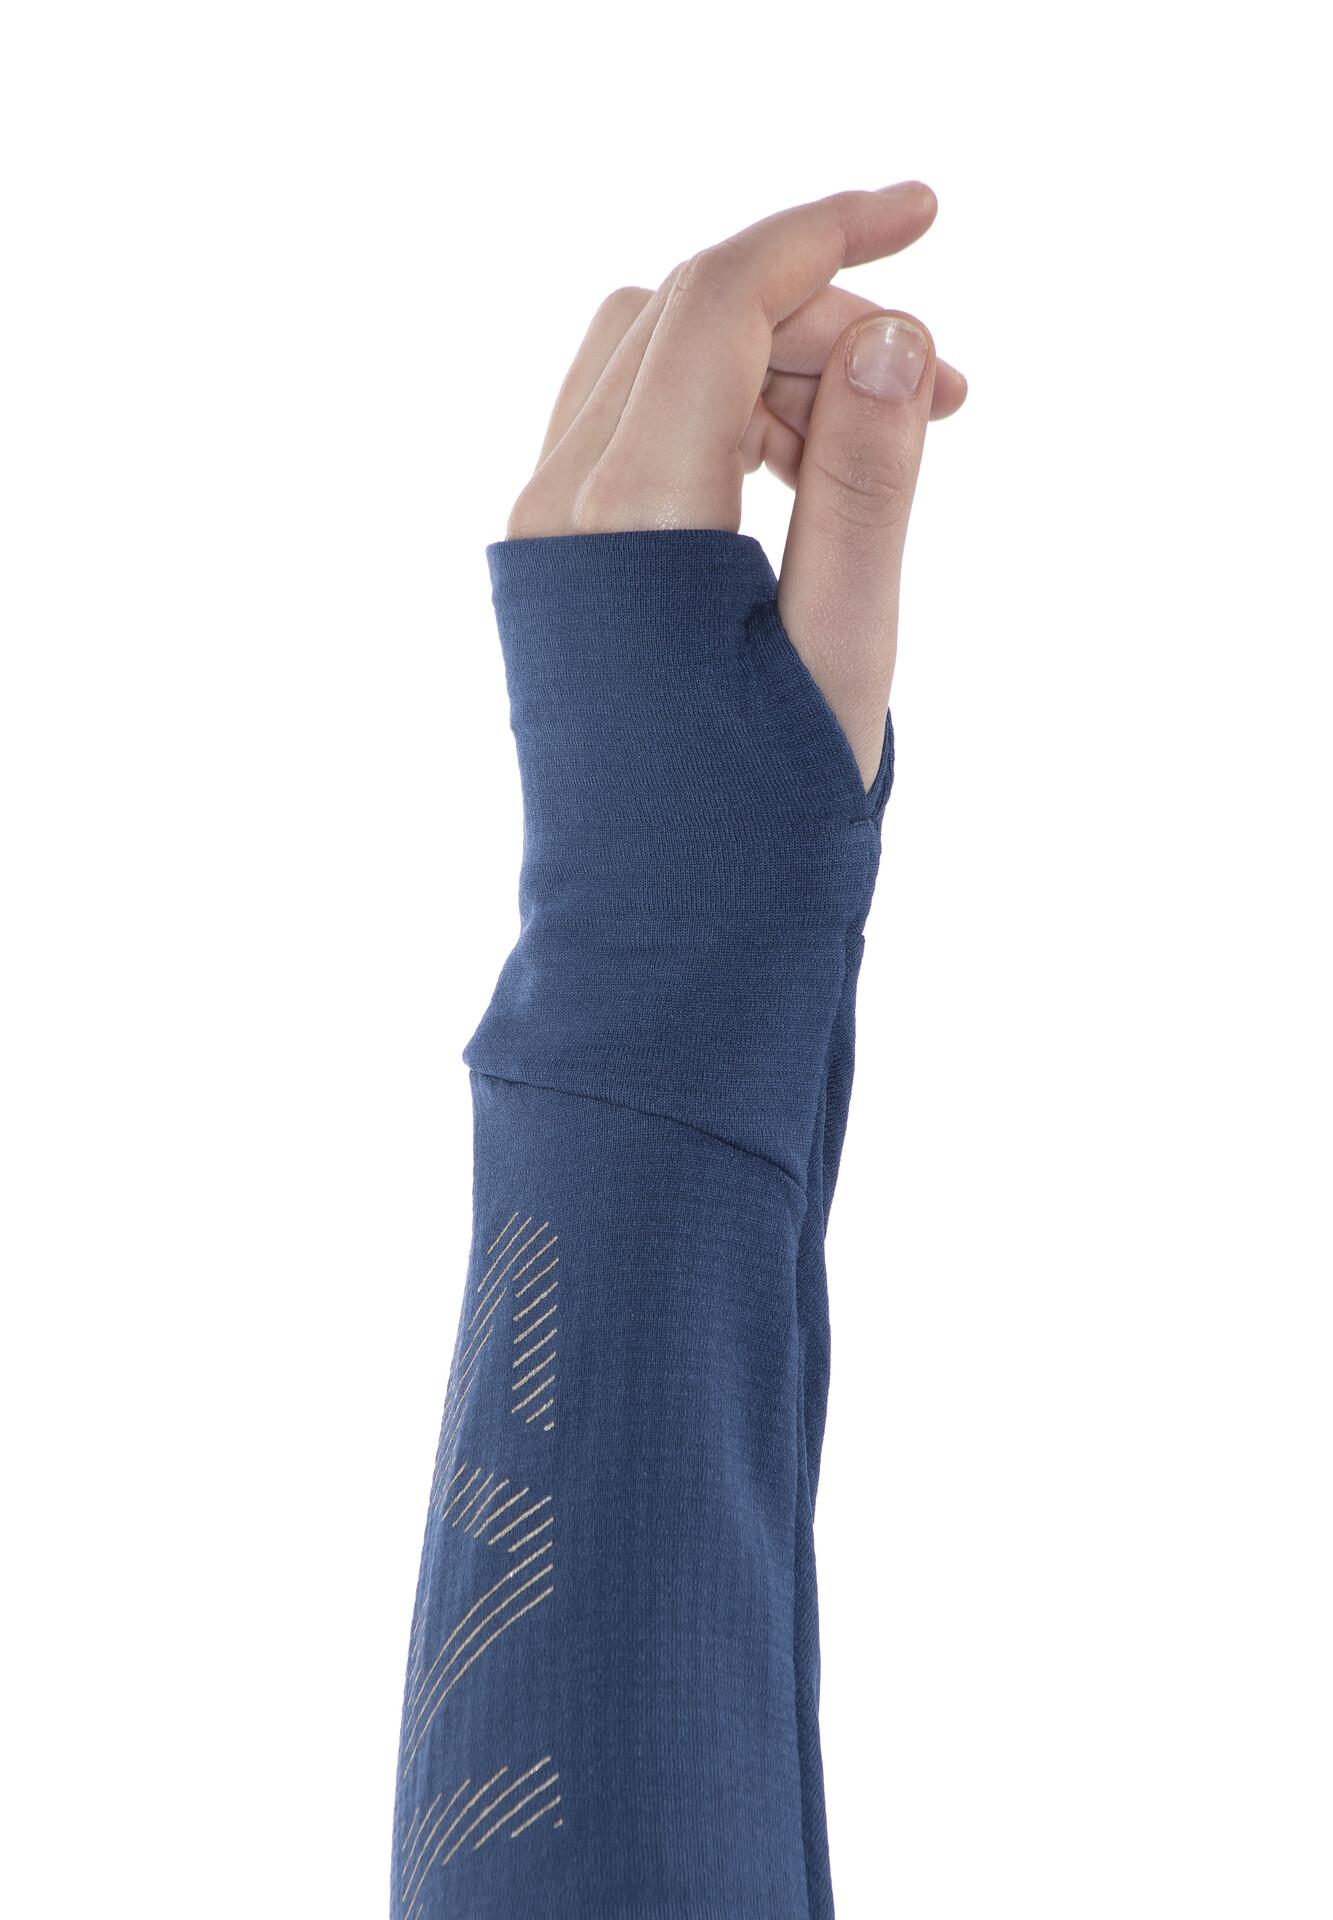 Salewa Alps Bleu Femme Alph X Sur Redbull Campz Ptc Veste Er0EPxq